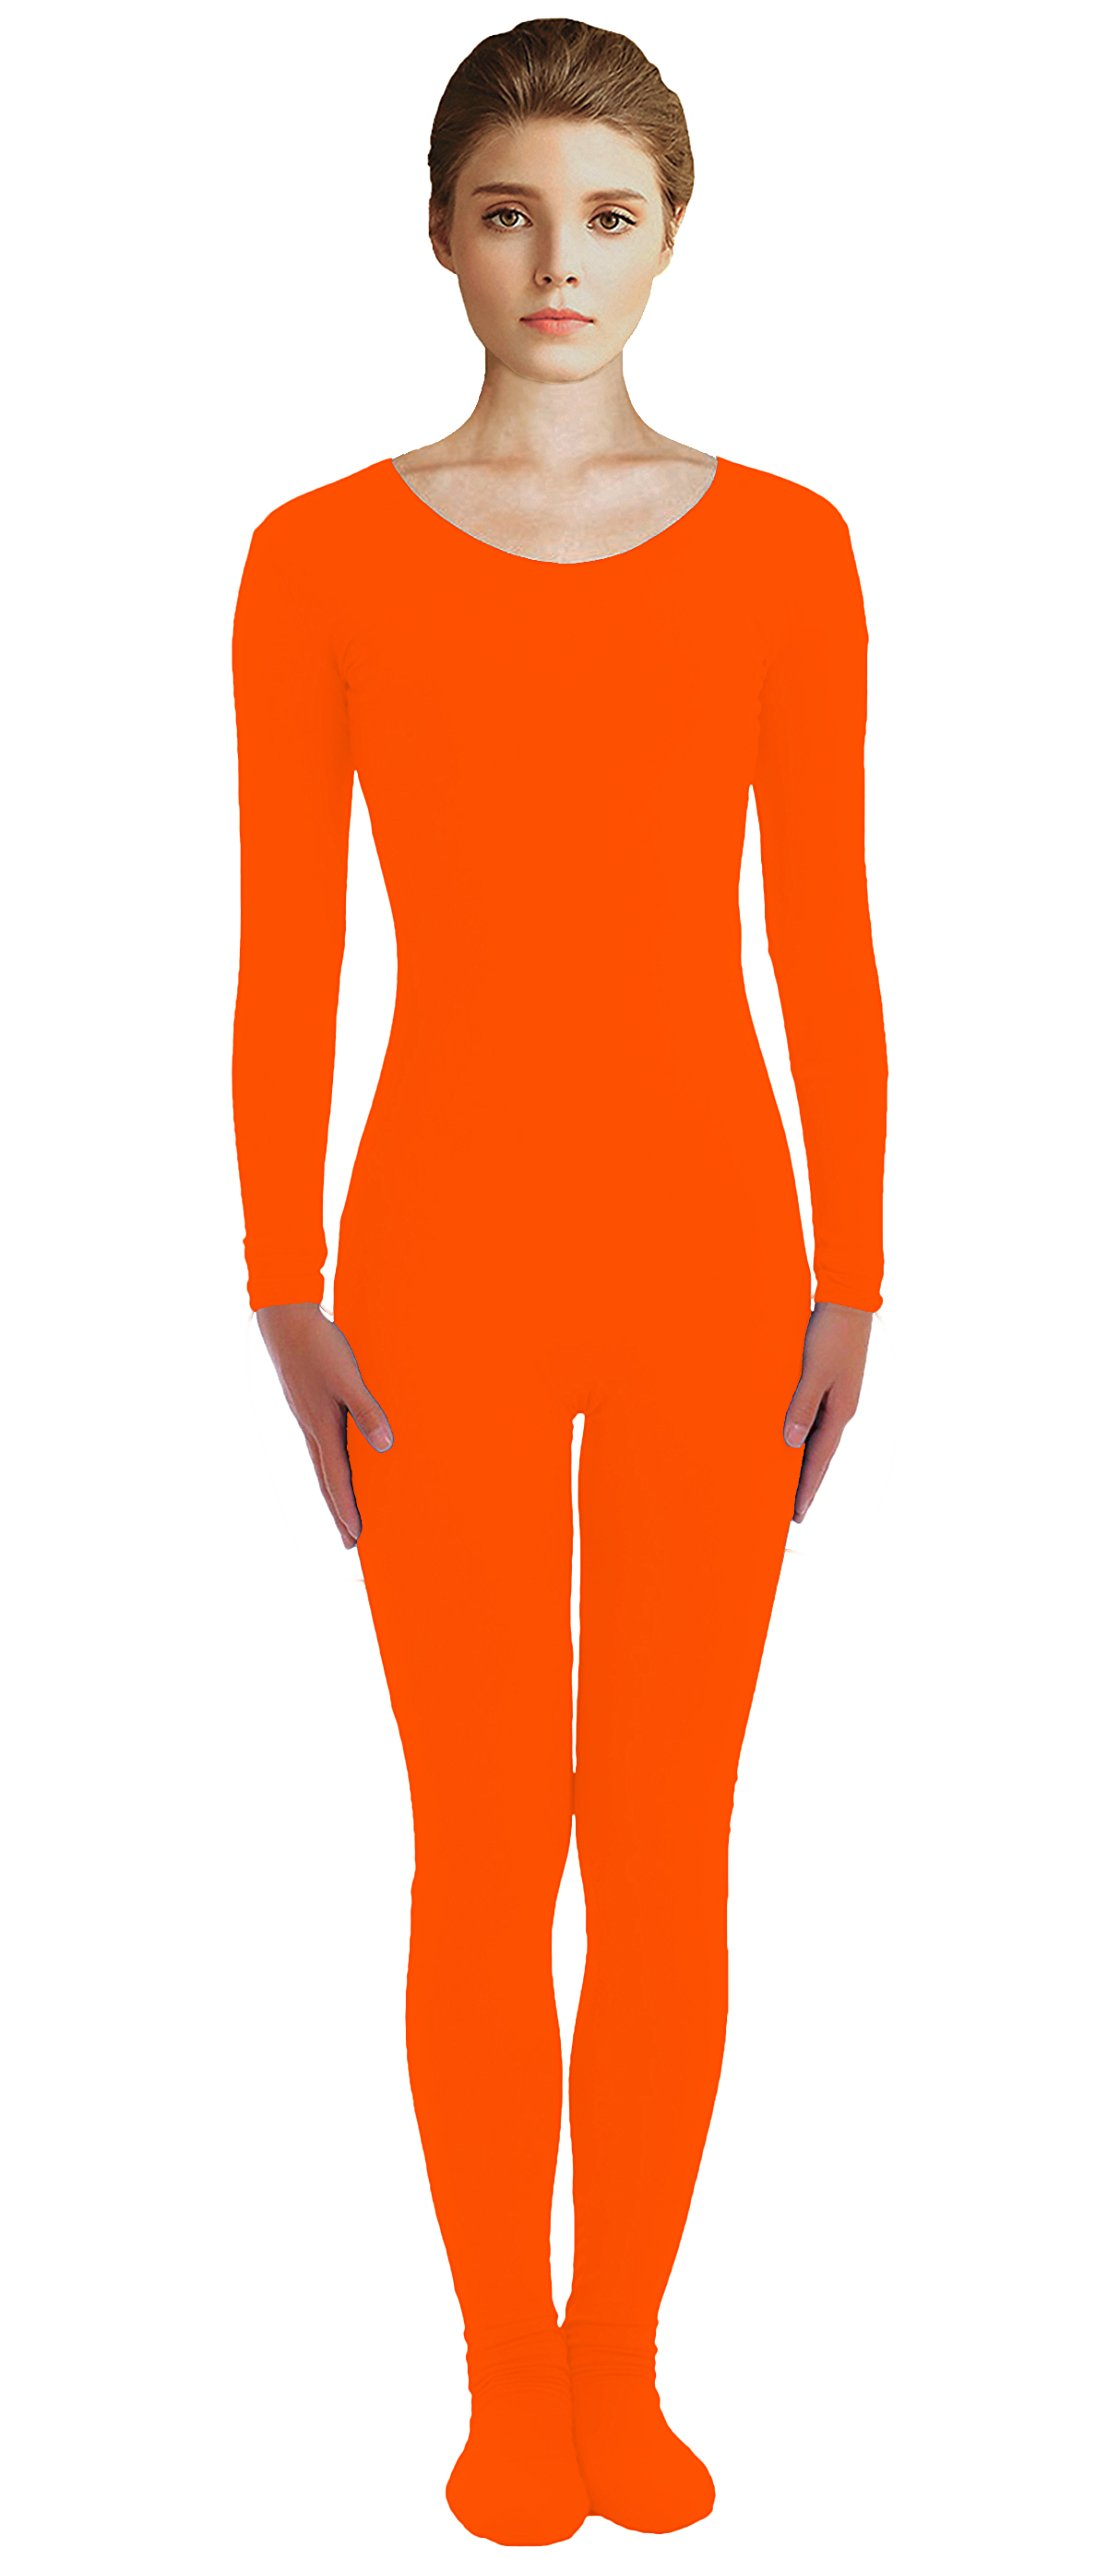 VSVO Adult Orange Scoop Neckline Unitard with Socks Catsuit Dancewear (Medium, Orange) by VSVO